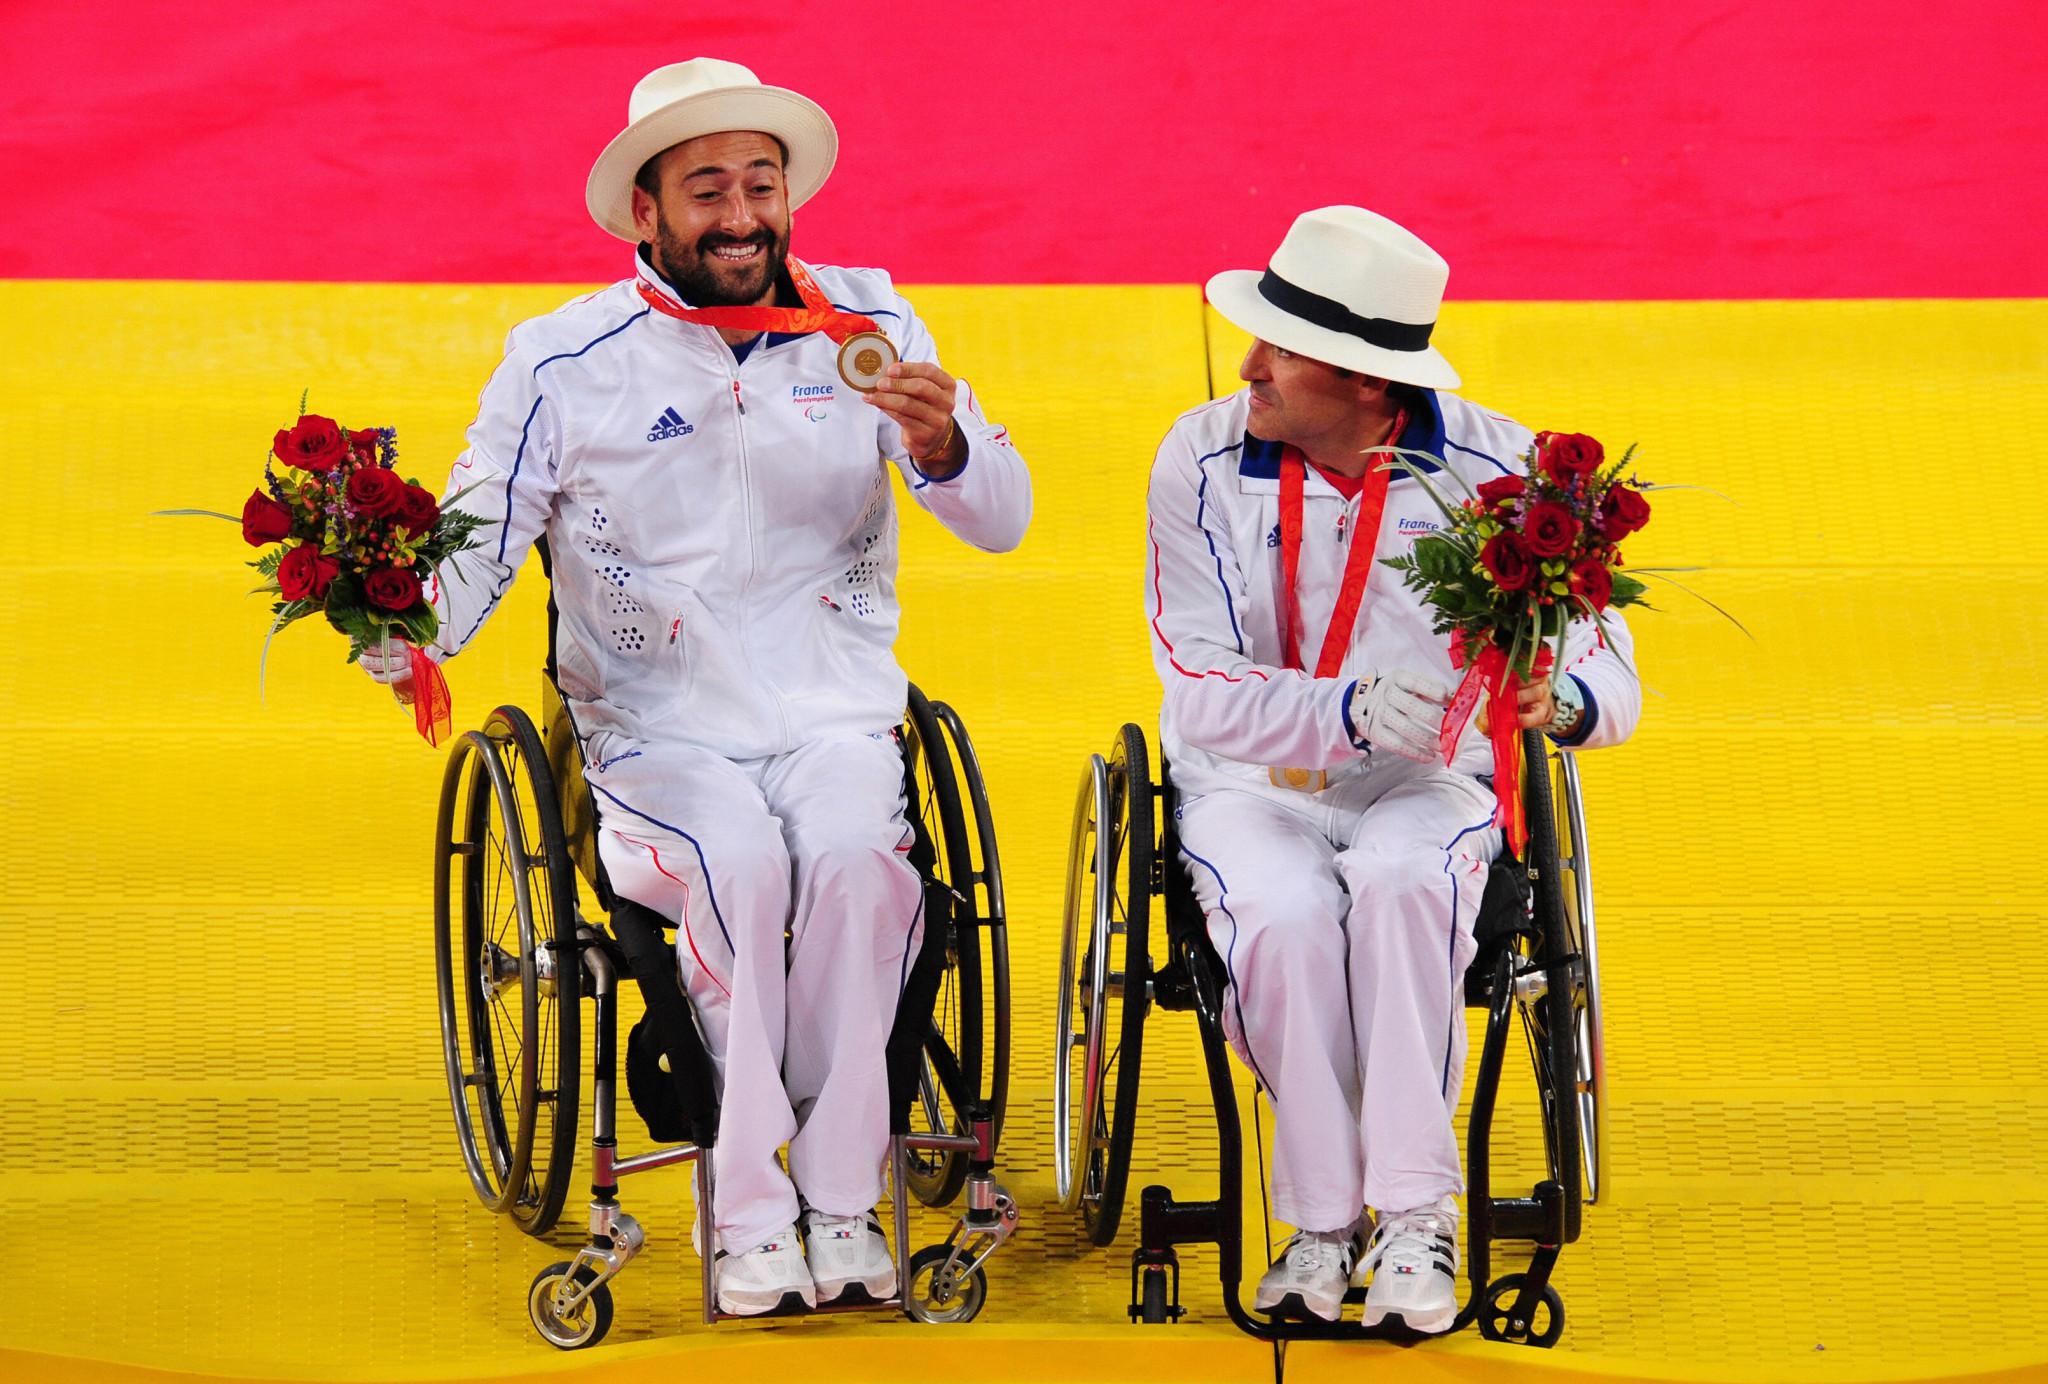 Michaël Jérémiasz earned Paralympic gold at Beijing 2008 alongside Stéphane Houdet ©Getty Images